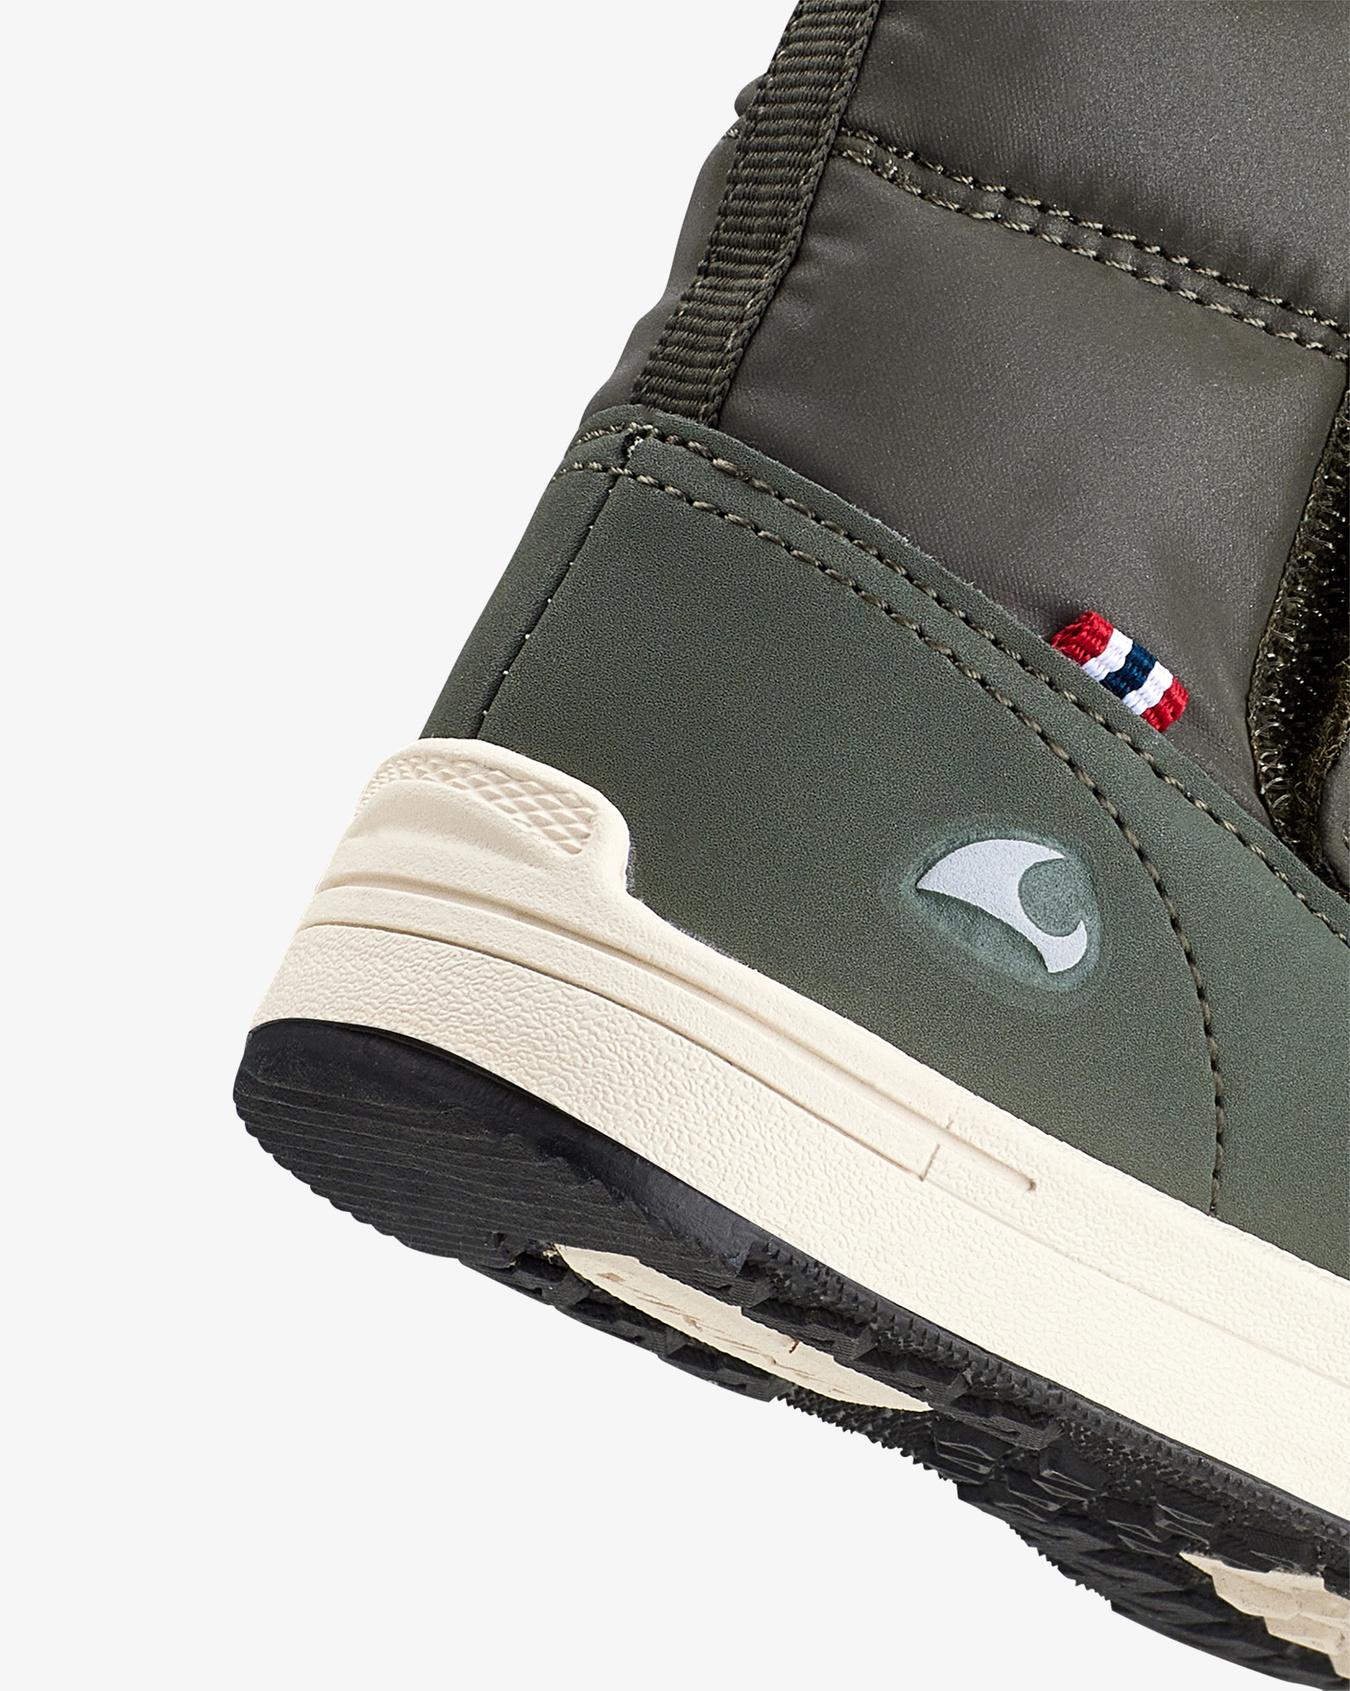 Hoston Green Winter Boots